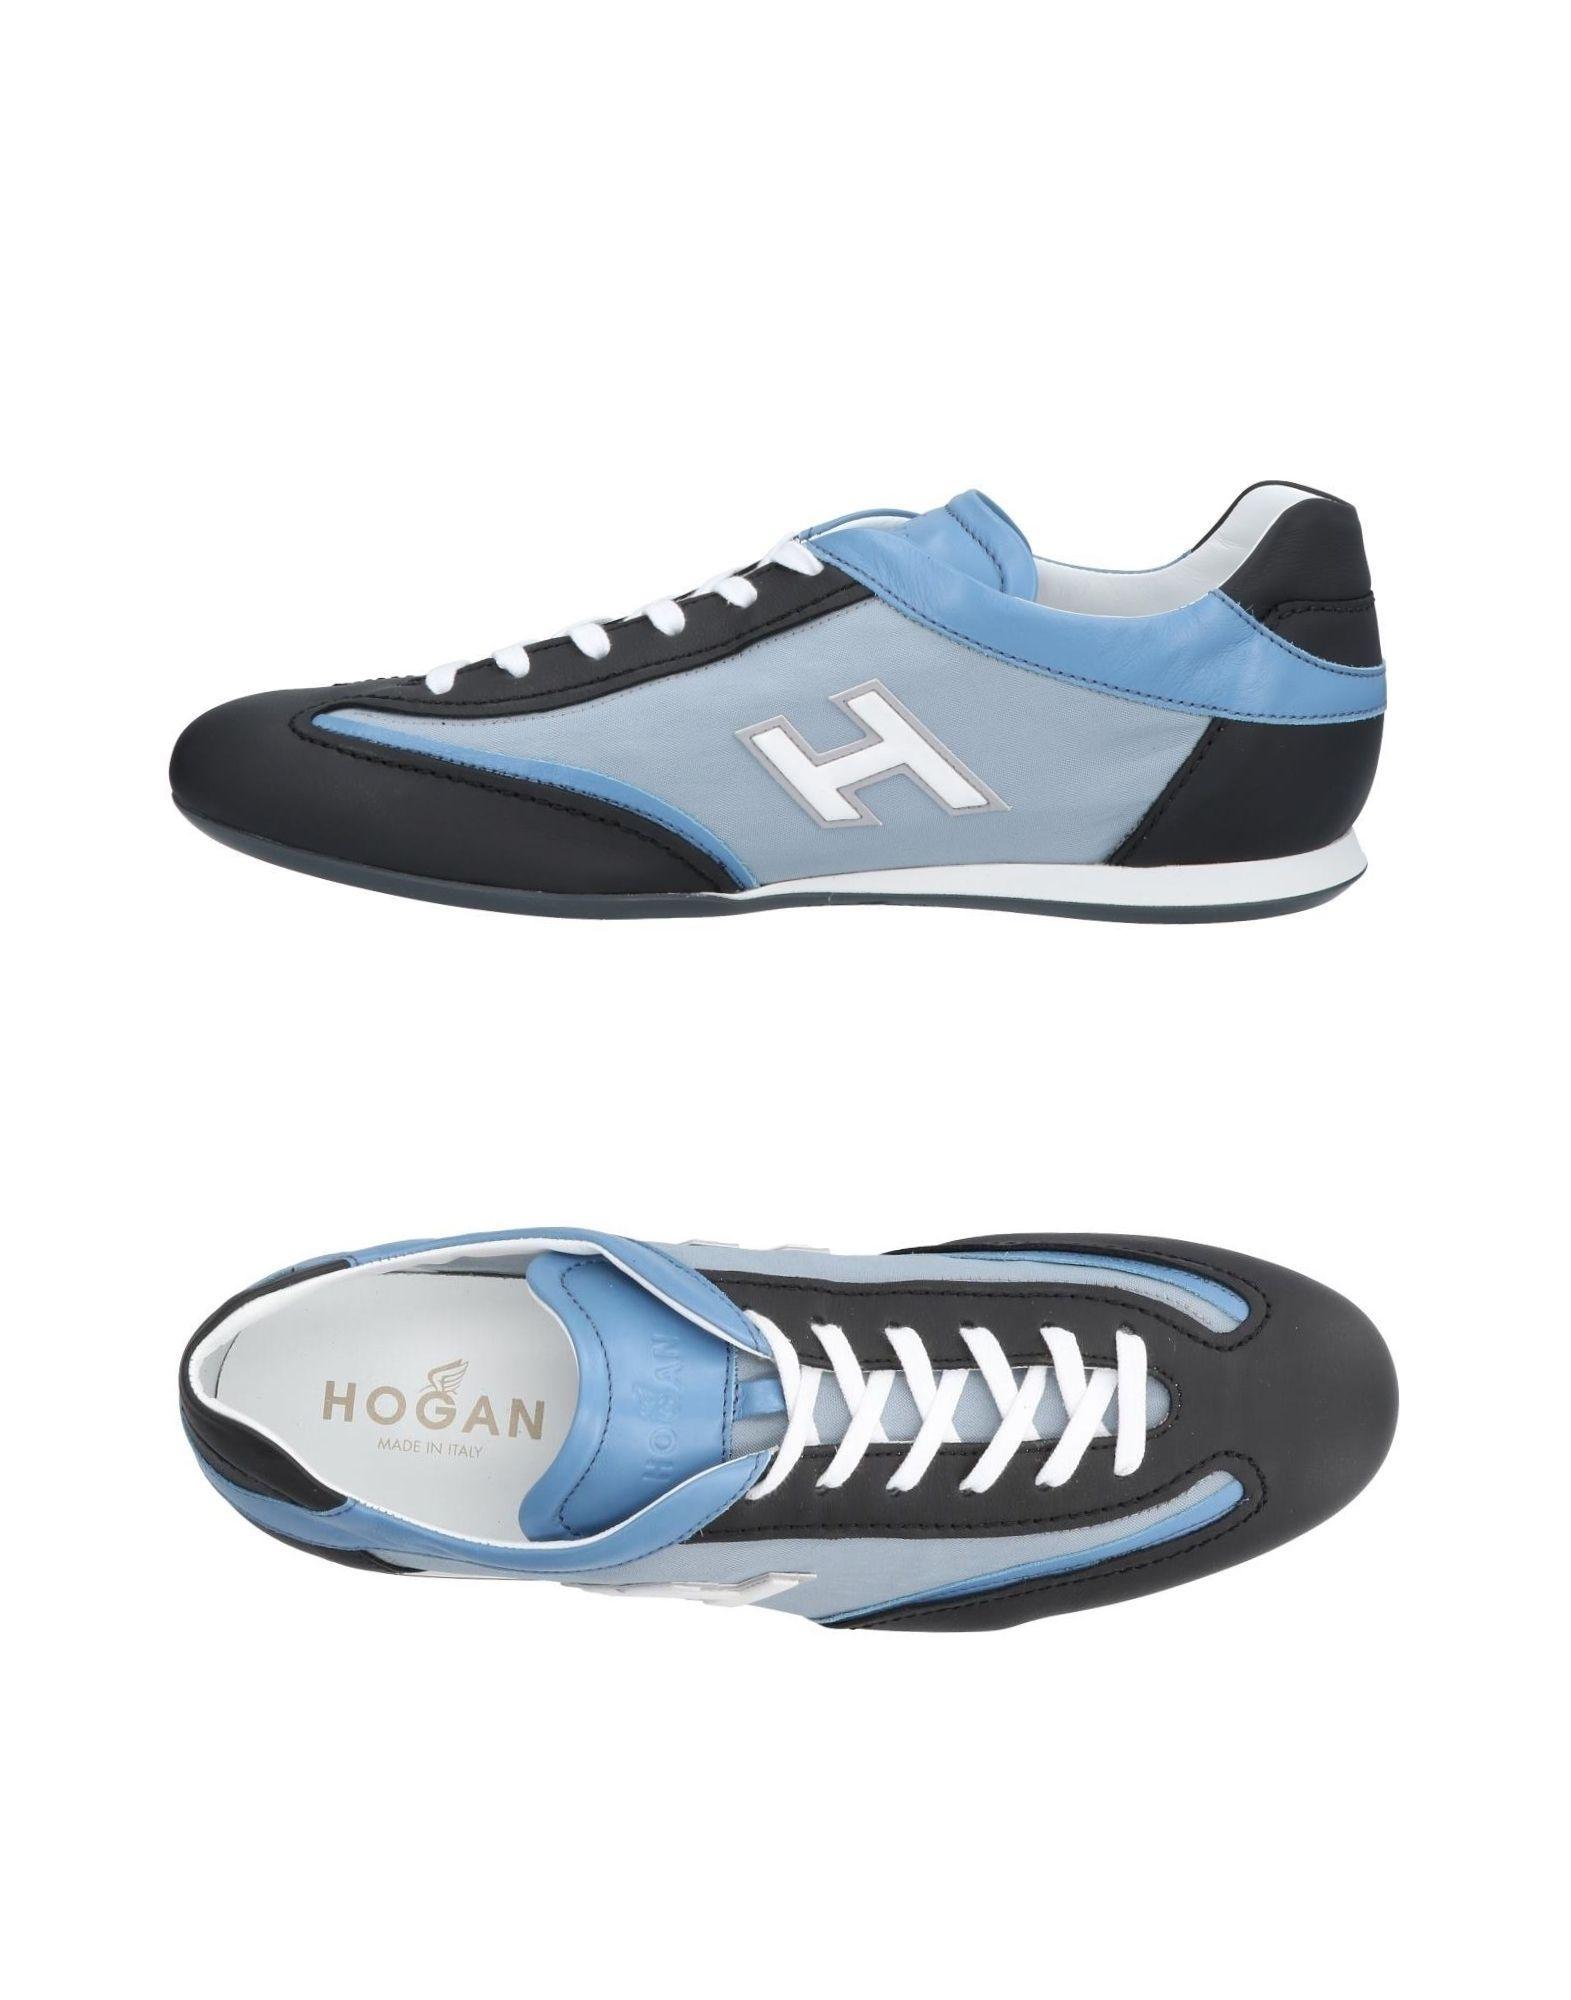 Hogan Sneakers Herren  11416857RT Gute Qualität beliebte Schuhe